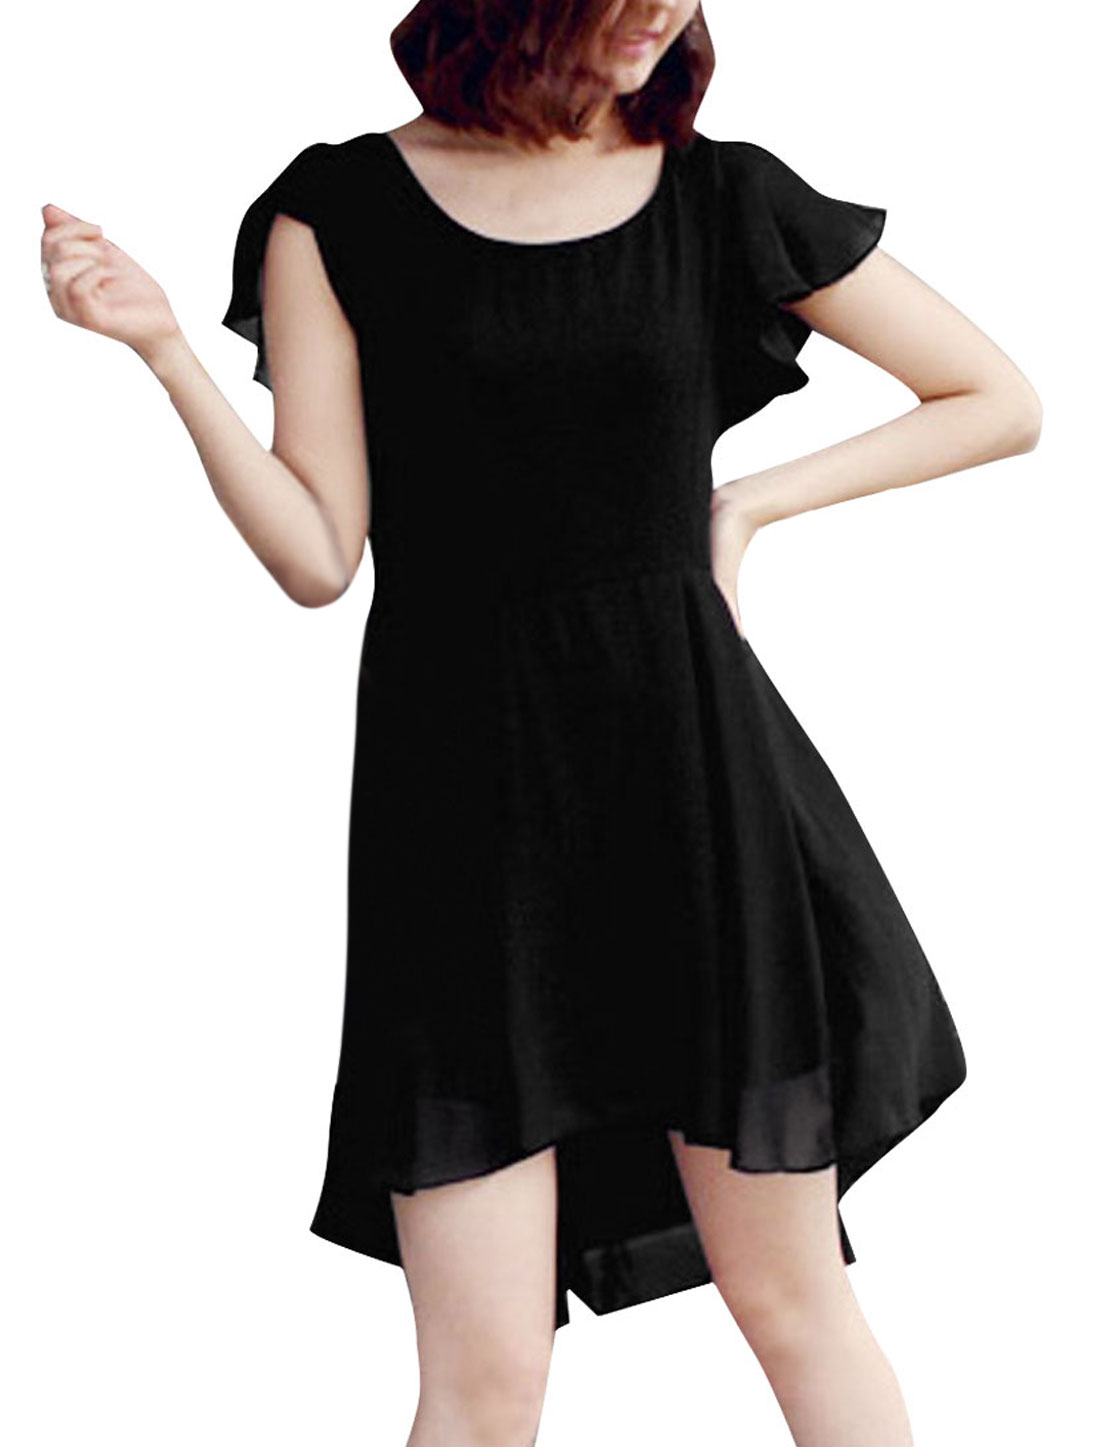 Lady Black Round Neck Ruffle Cap Sleeve Irregular Hem Chiffon Dress XS